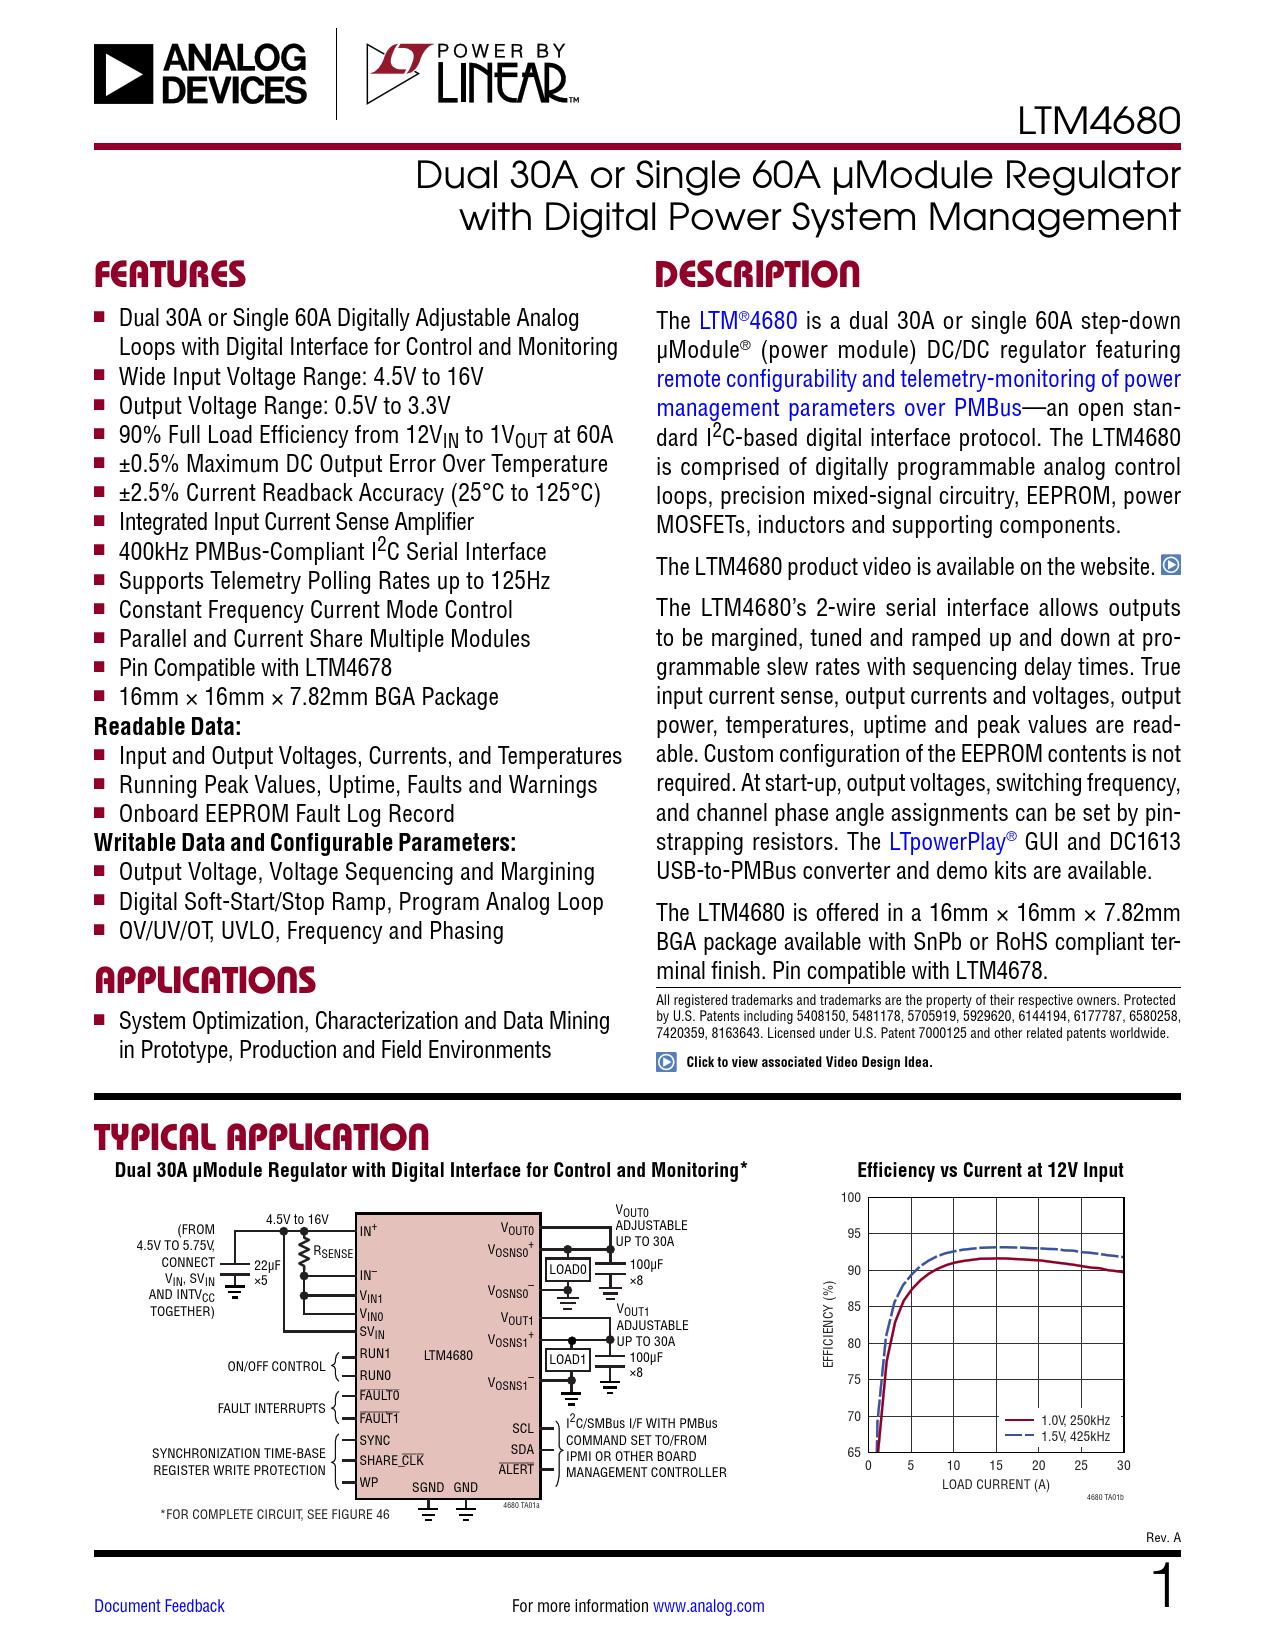 Datasheet LTM4680 Analog Devices, Версия: A